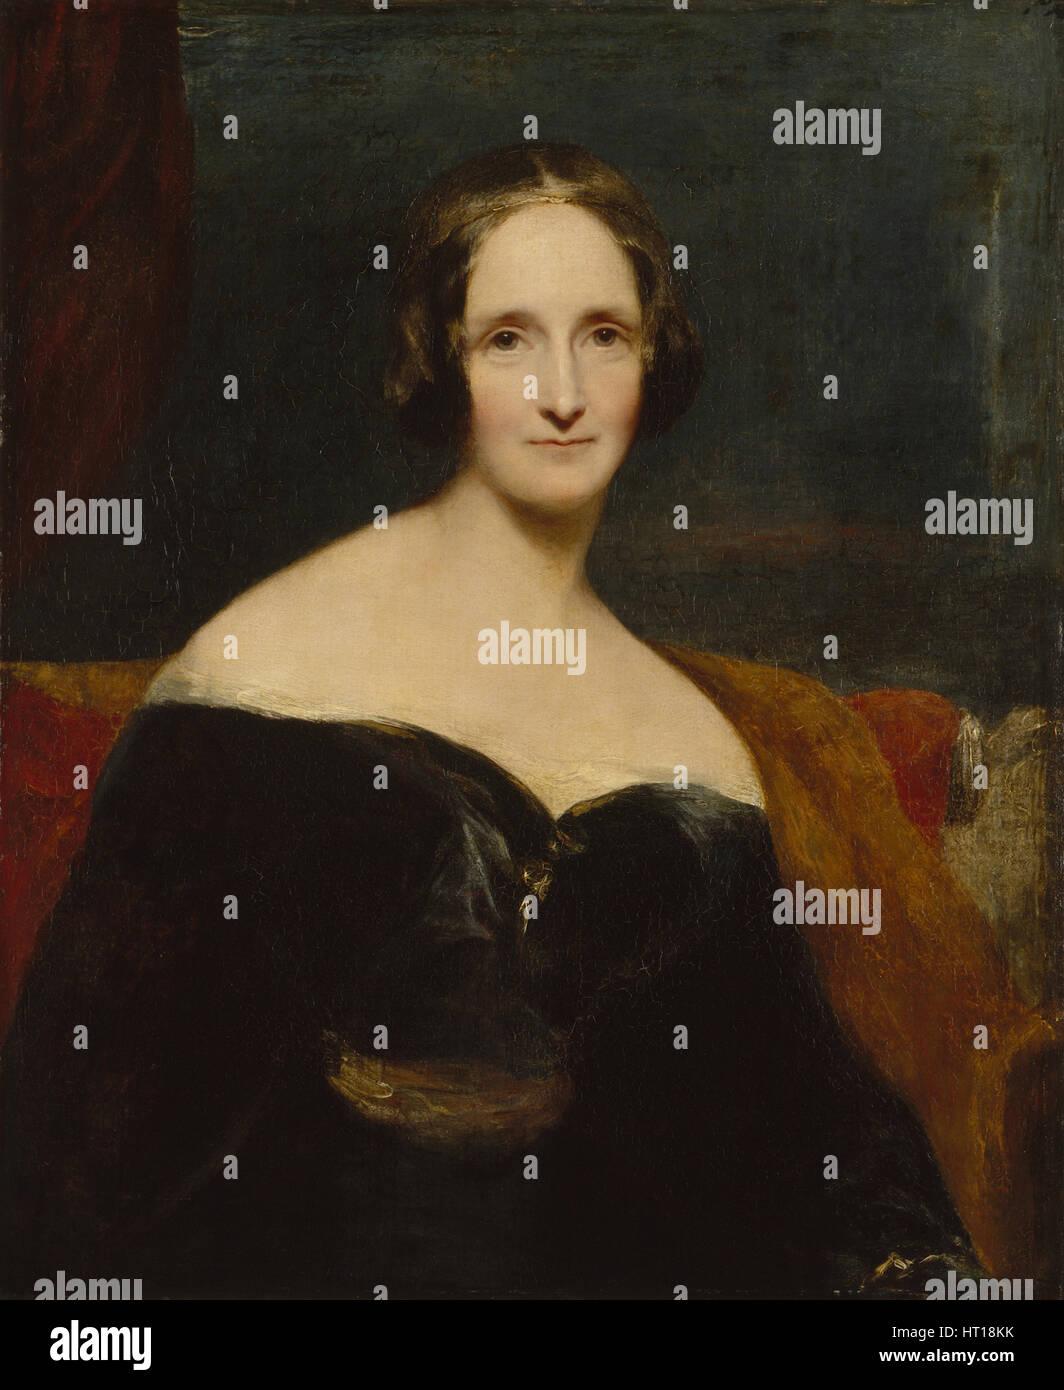 Mary Shelley, 1840. Artista: Rothwell, Richard (1800-1868) Immagini Stock